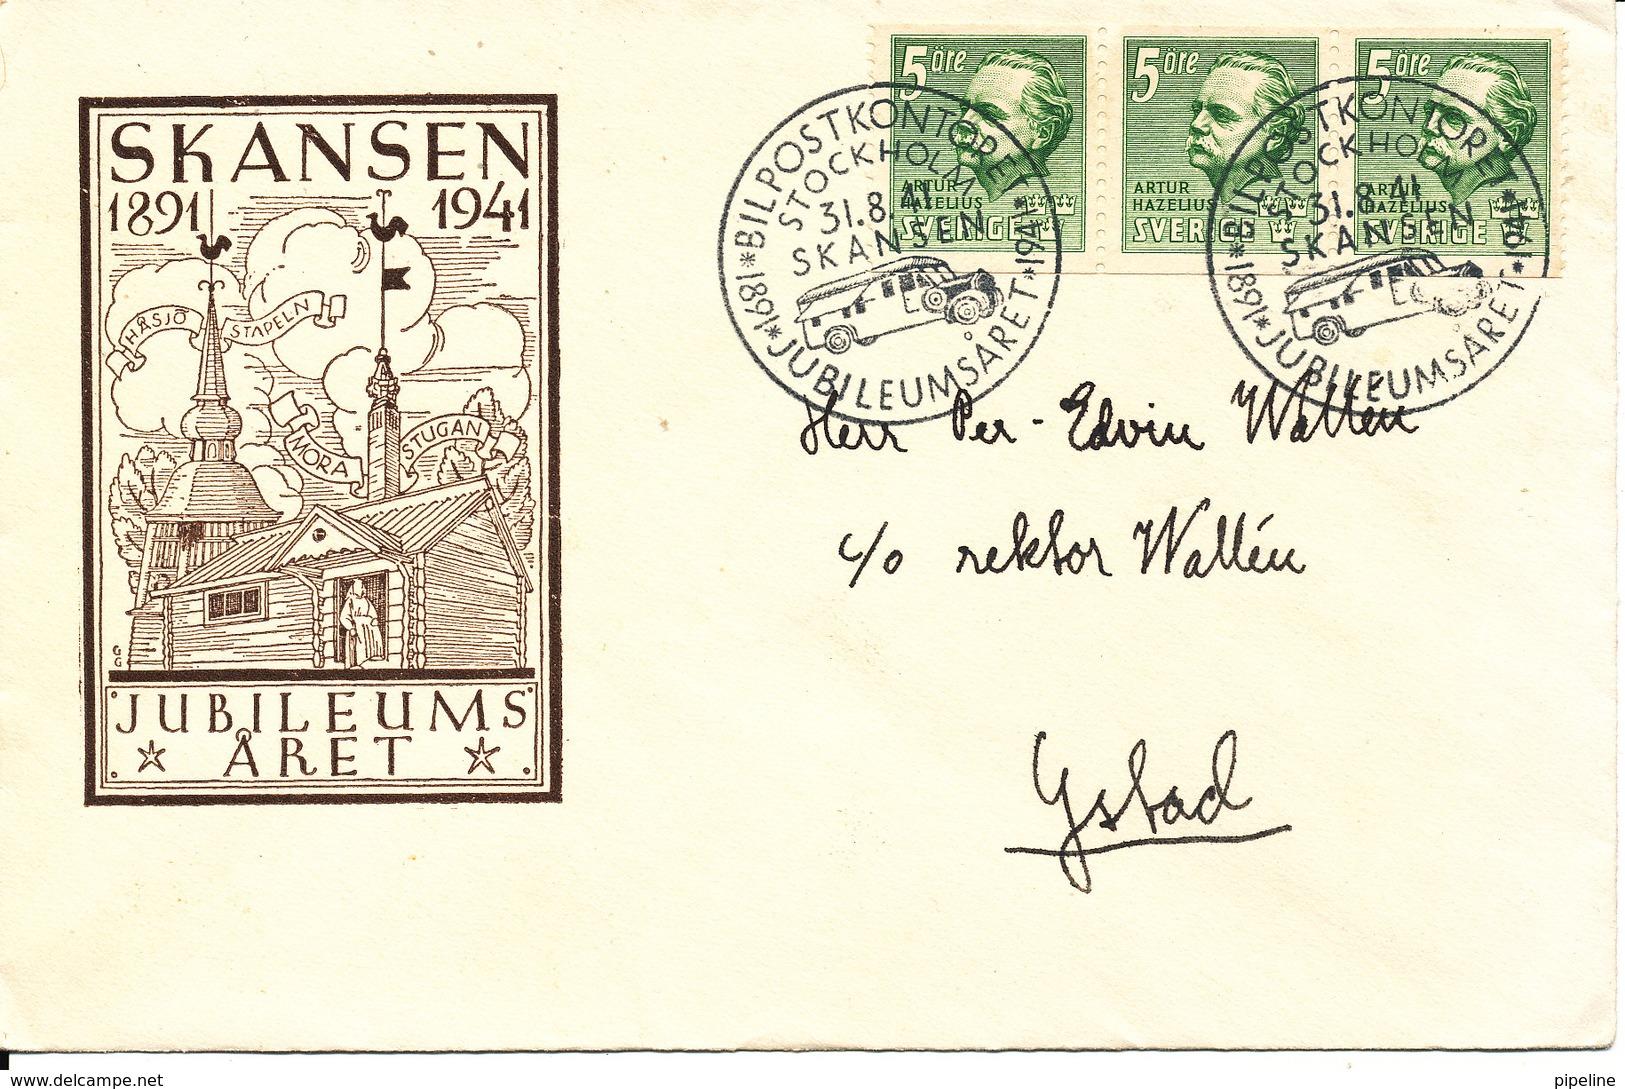 Sweden Cover With Skansen Cachet And AUTO POST OFFICE Skansen 31-8-1941 - Sweden